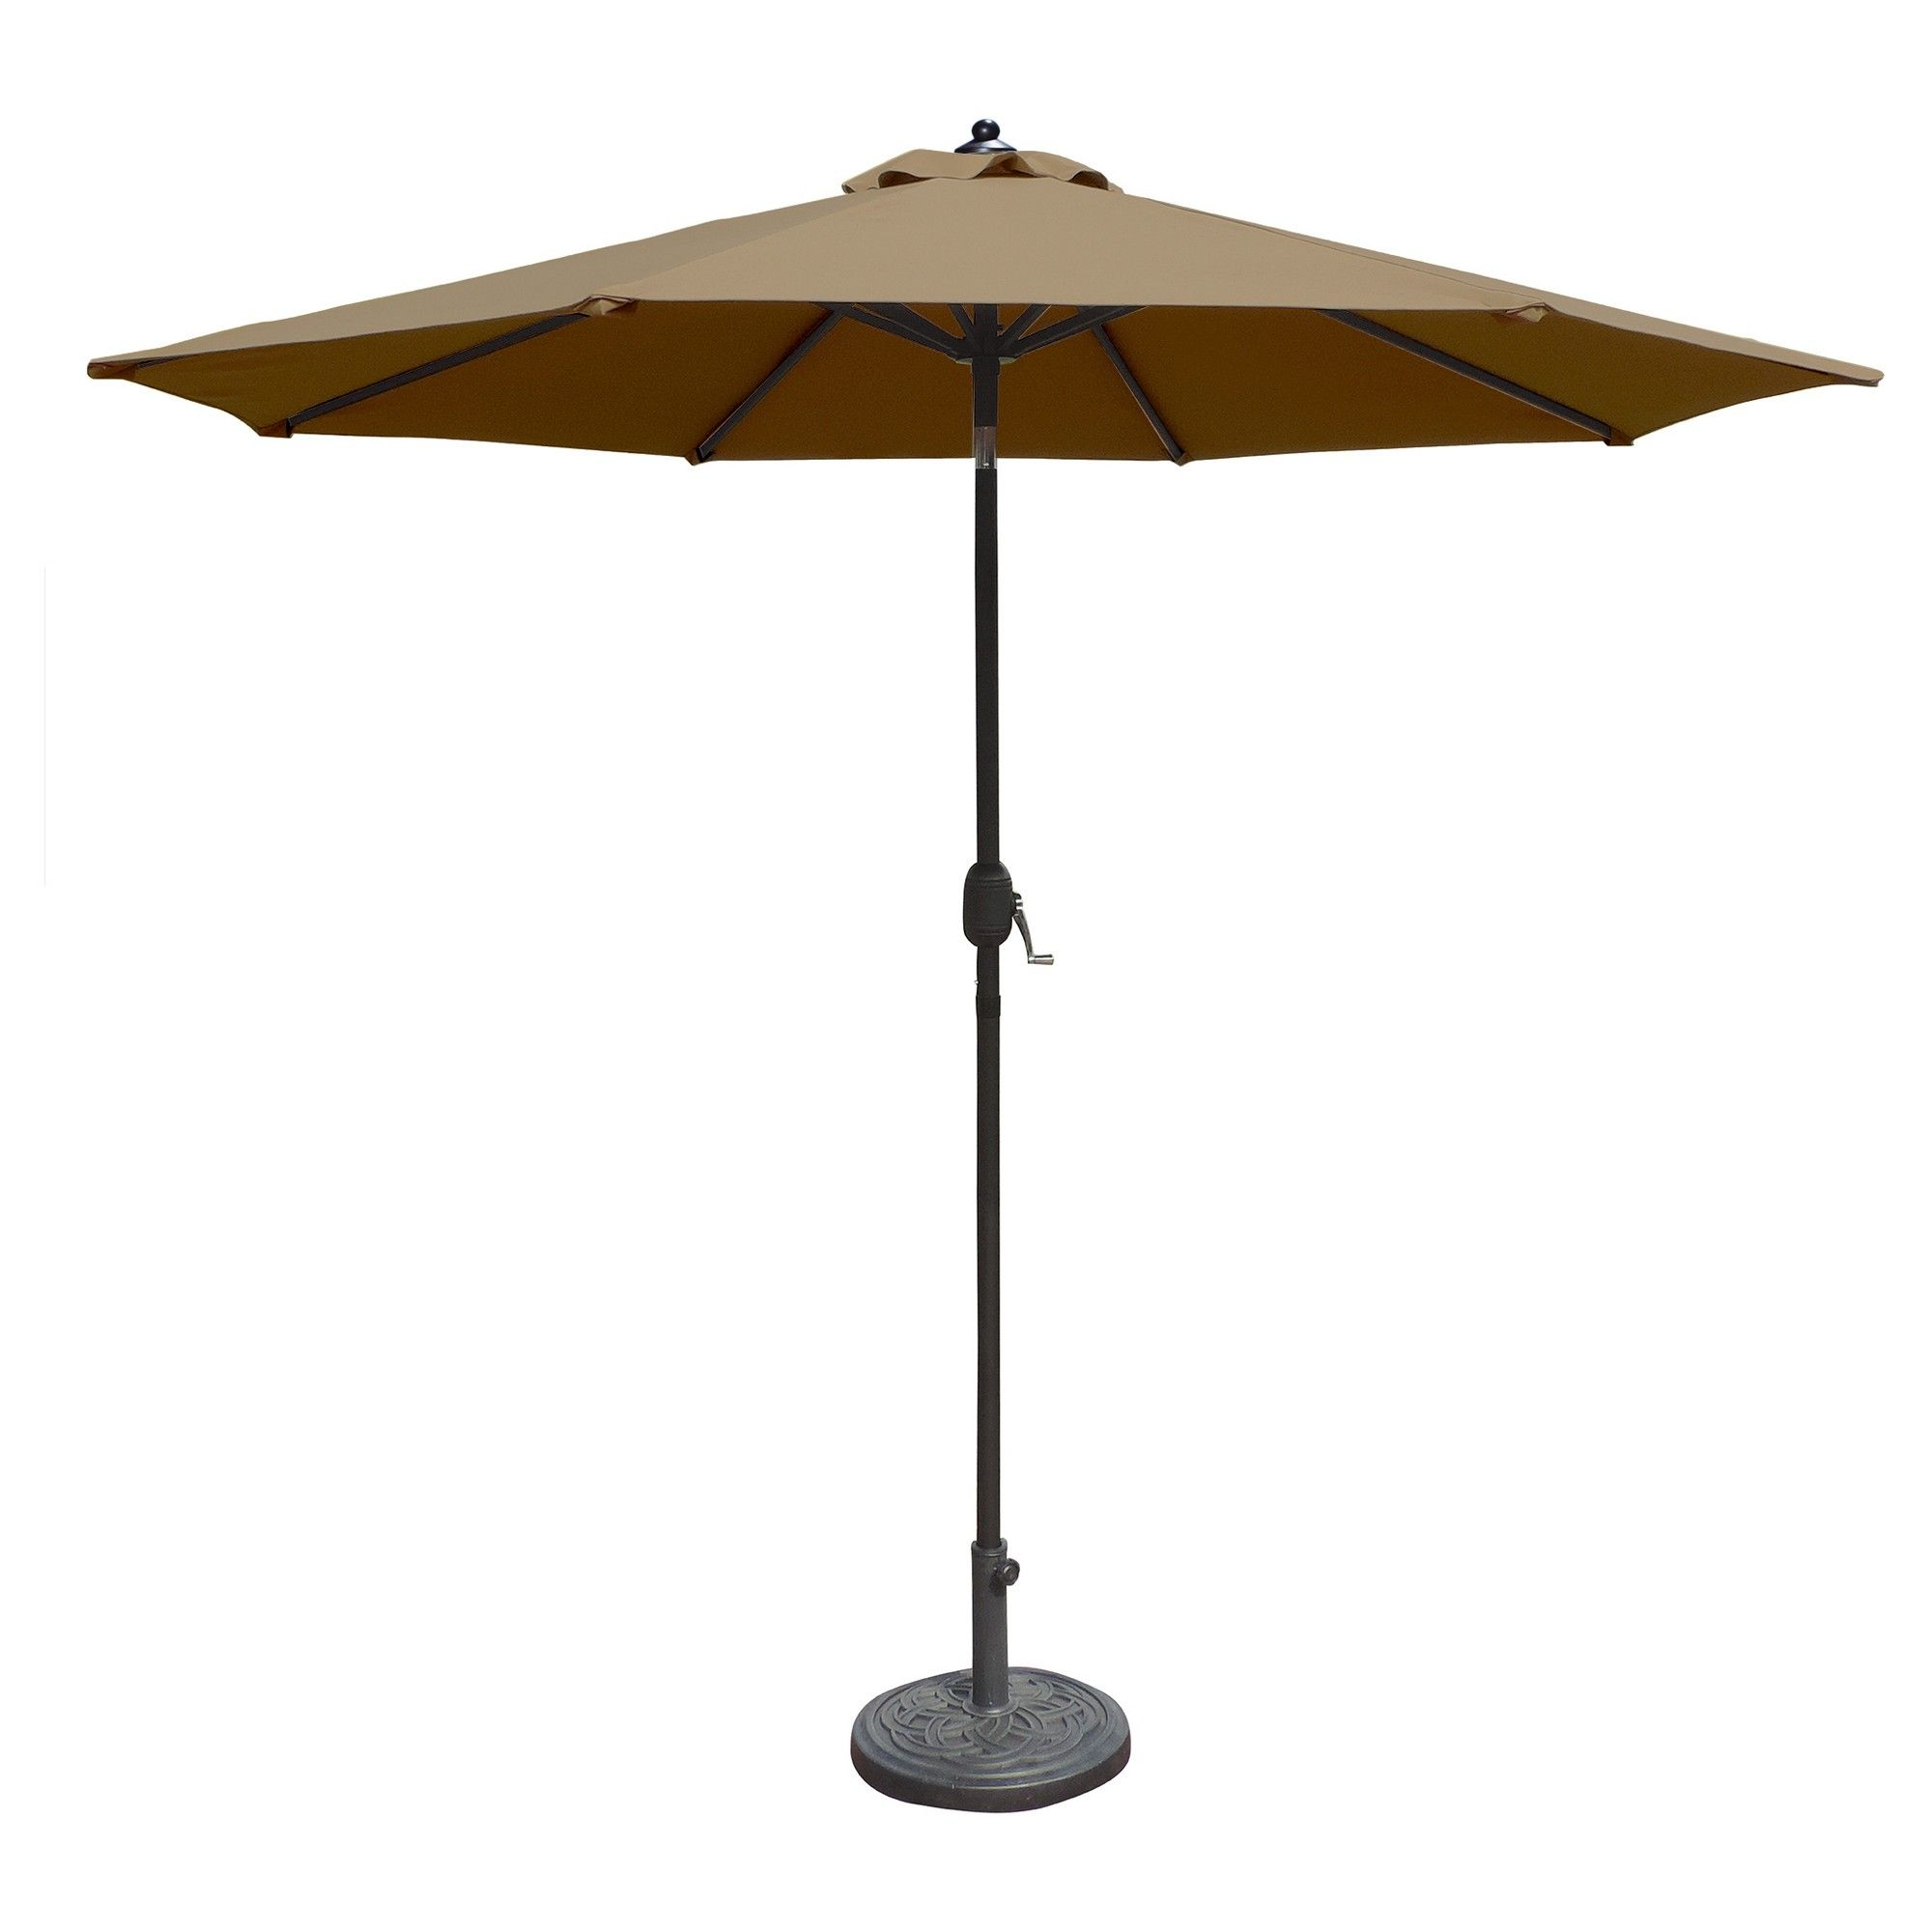 Island Umbrella Mirage 9 Market Umbrella In Stone Olefin